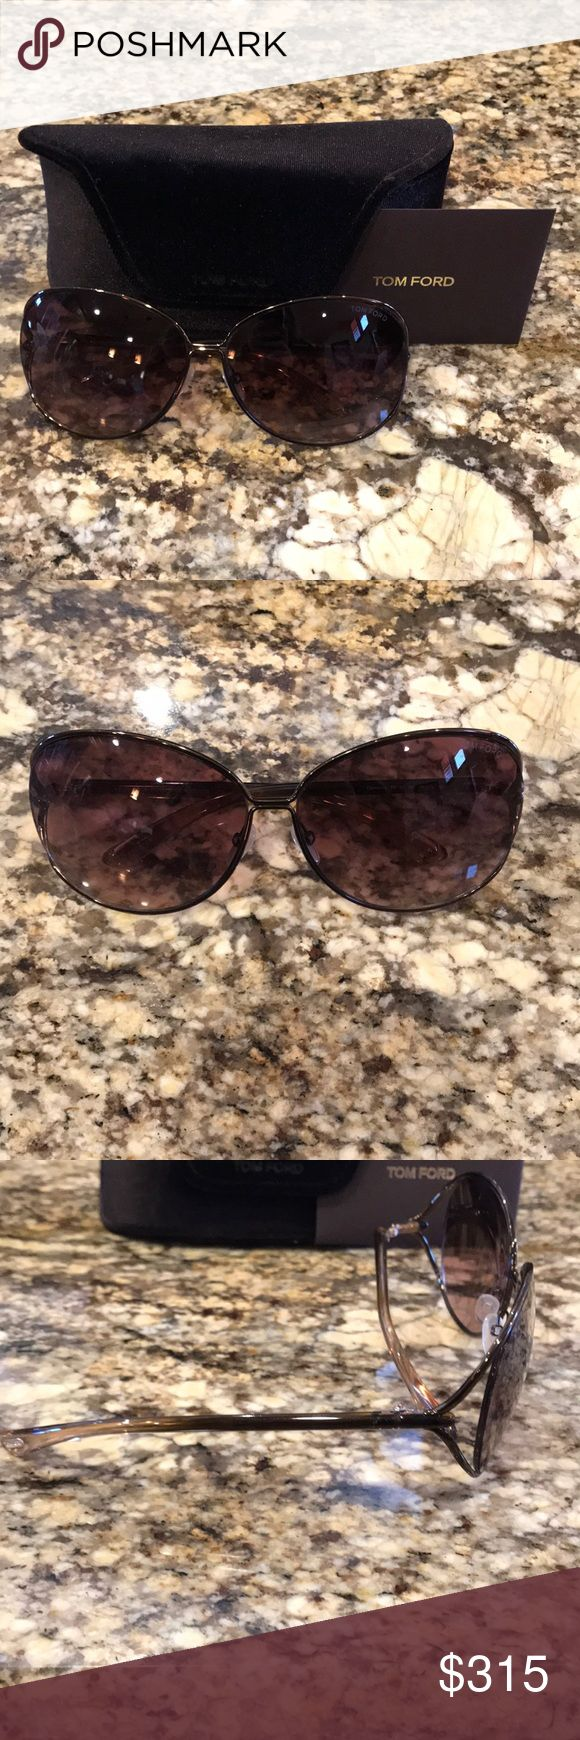 Tom Ford bronze Miranda Sunglasses Tom Ford Bronze Miranda Sunglasses Tom Ford Accessories Sunglasses